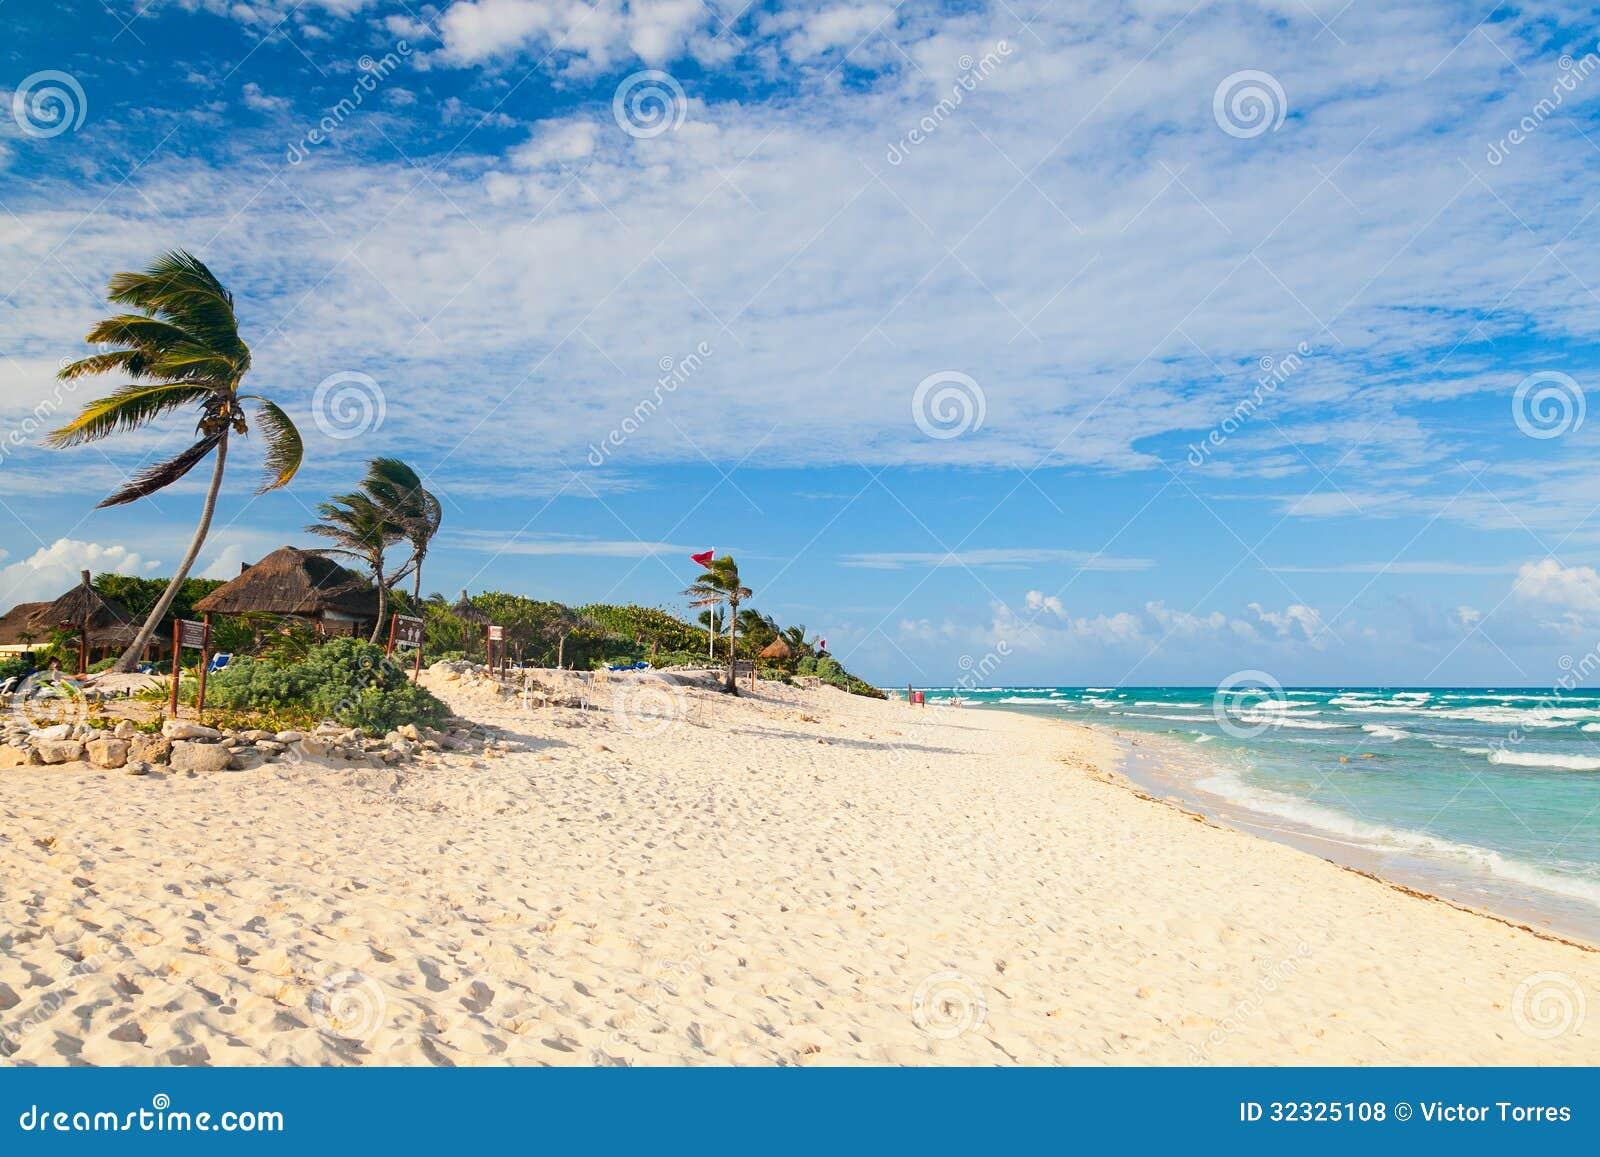 Caribbean Beach Royalty Free Stock Photos - Image: 32325108